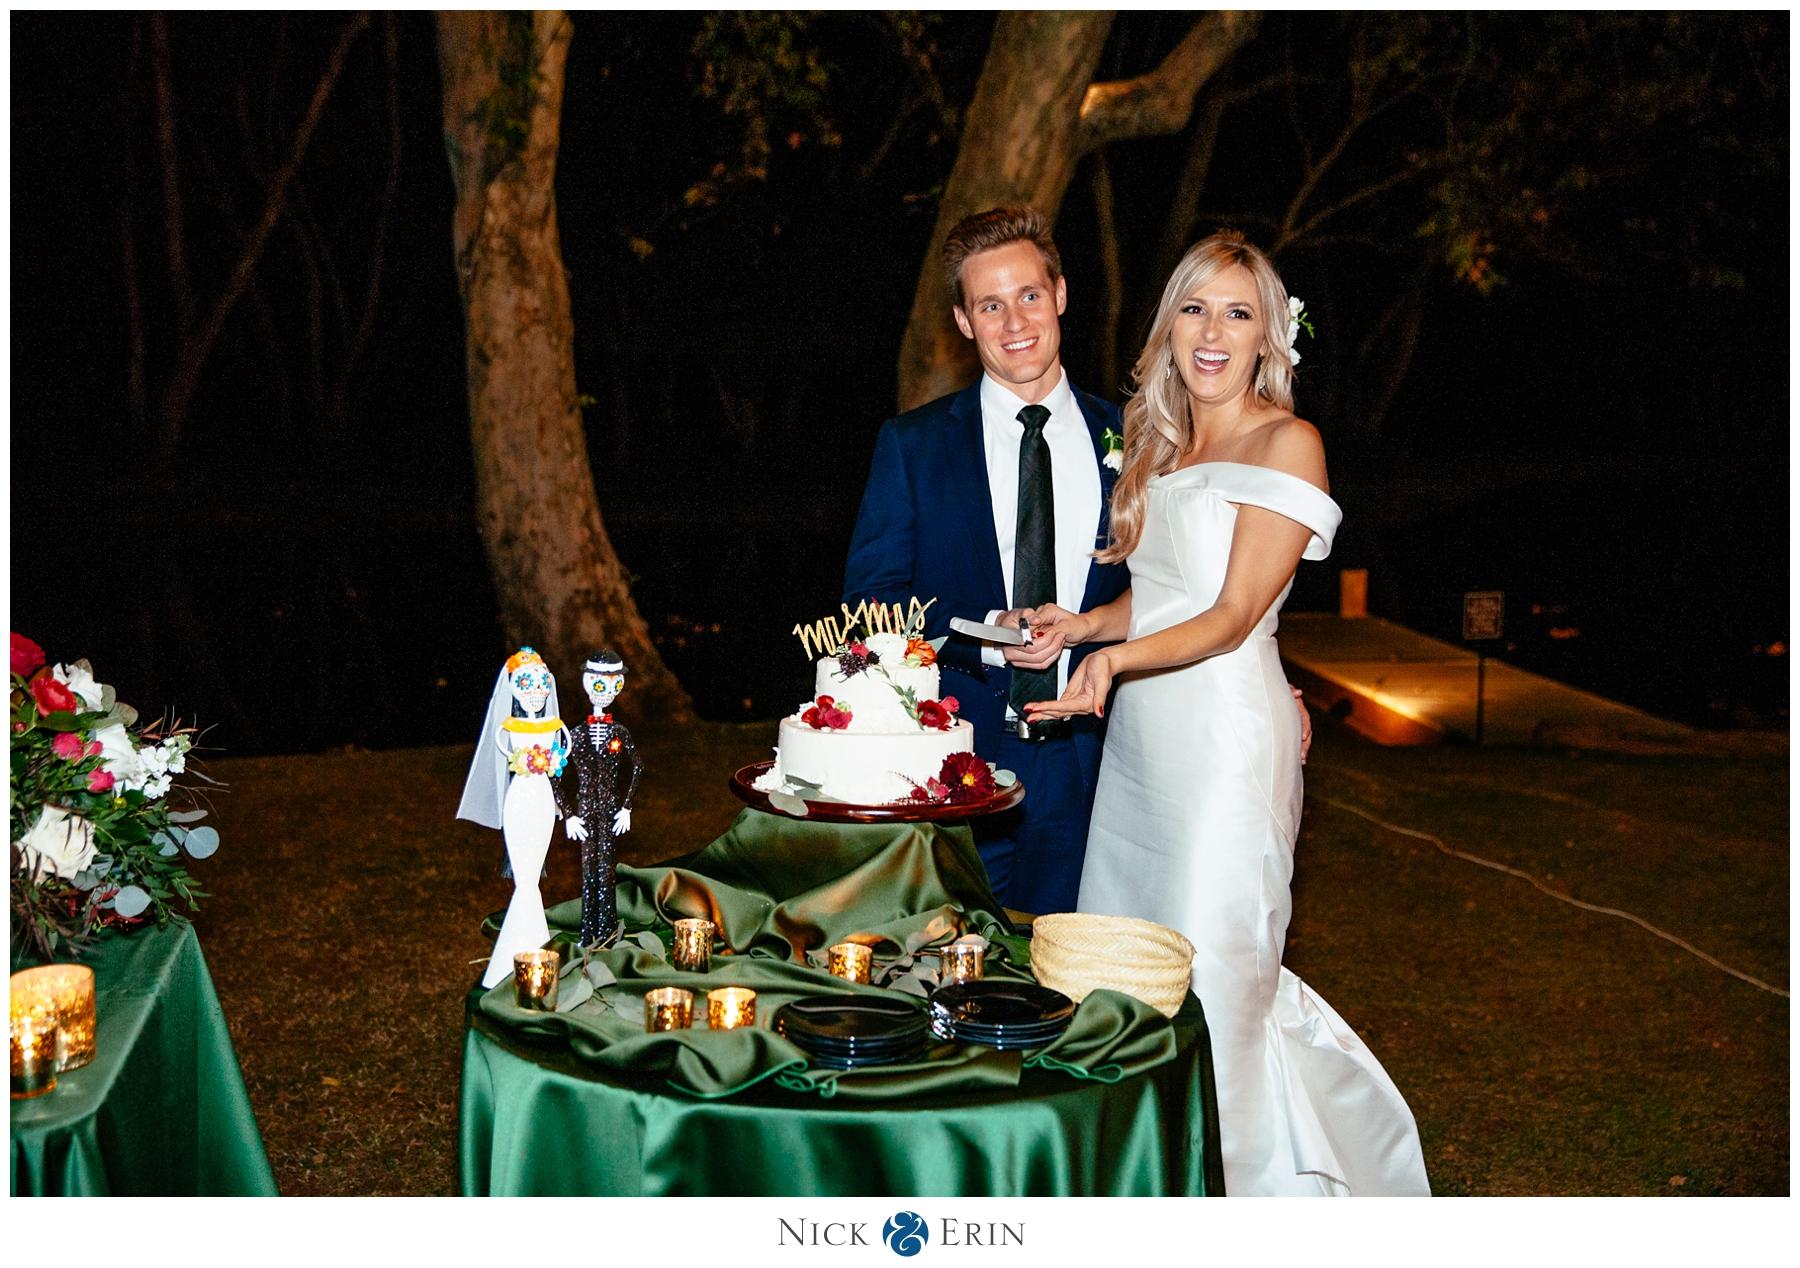 Donner_Photography_Sedona Arizona Wedding_Alissa and Tom_0069